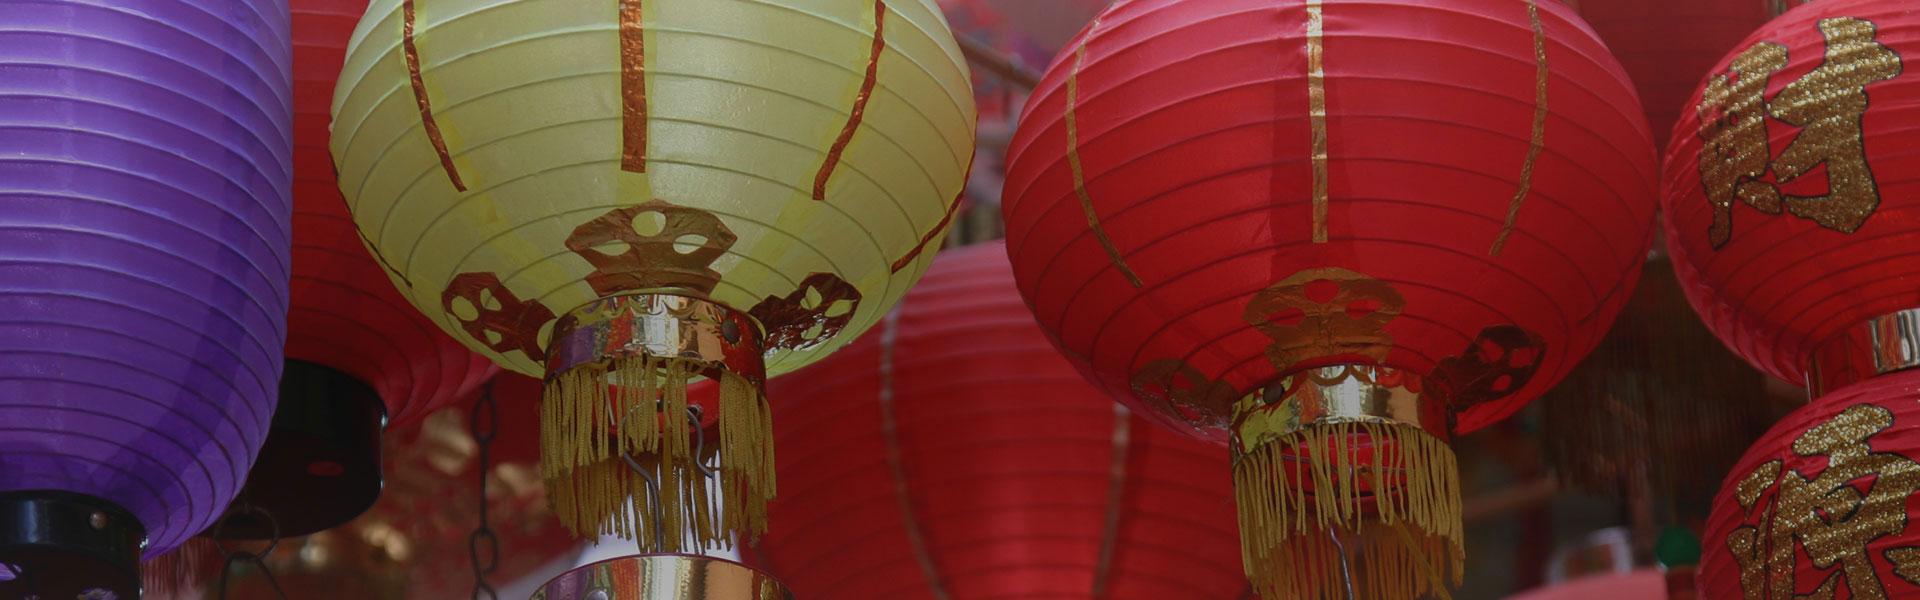 Chinese Lanterns at Stanley Market Hong Kong